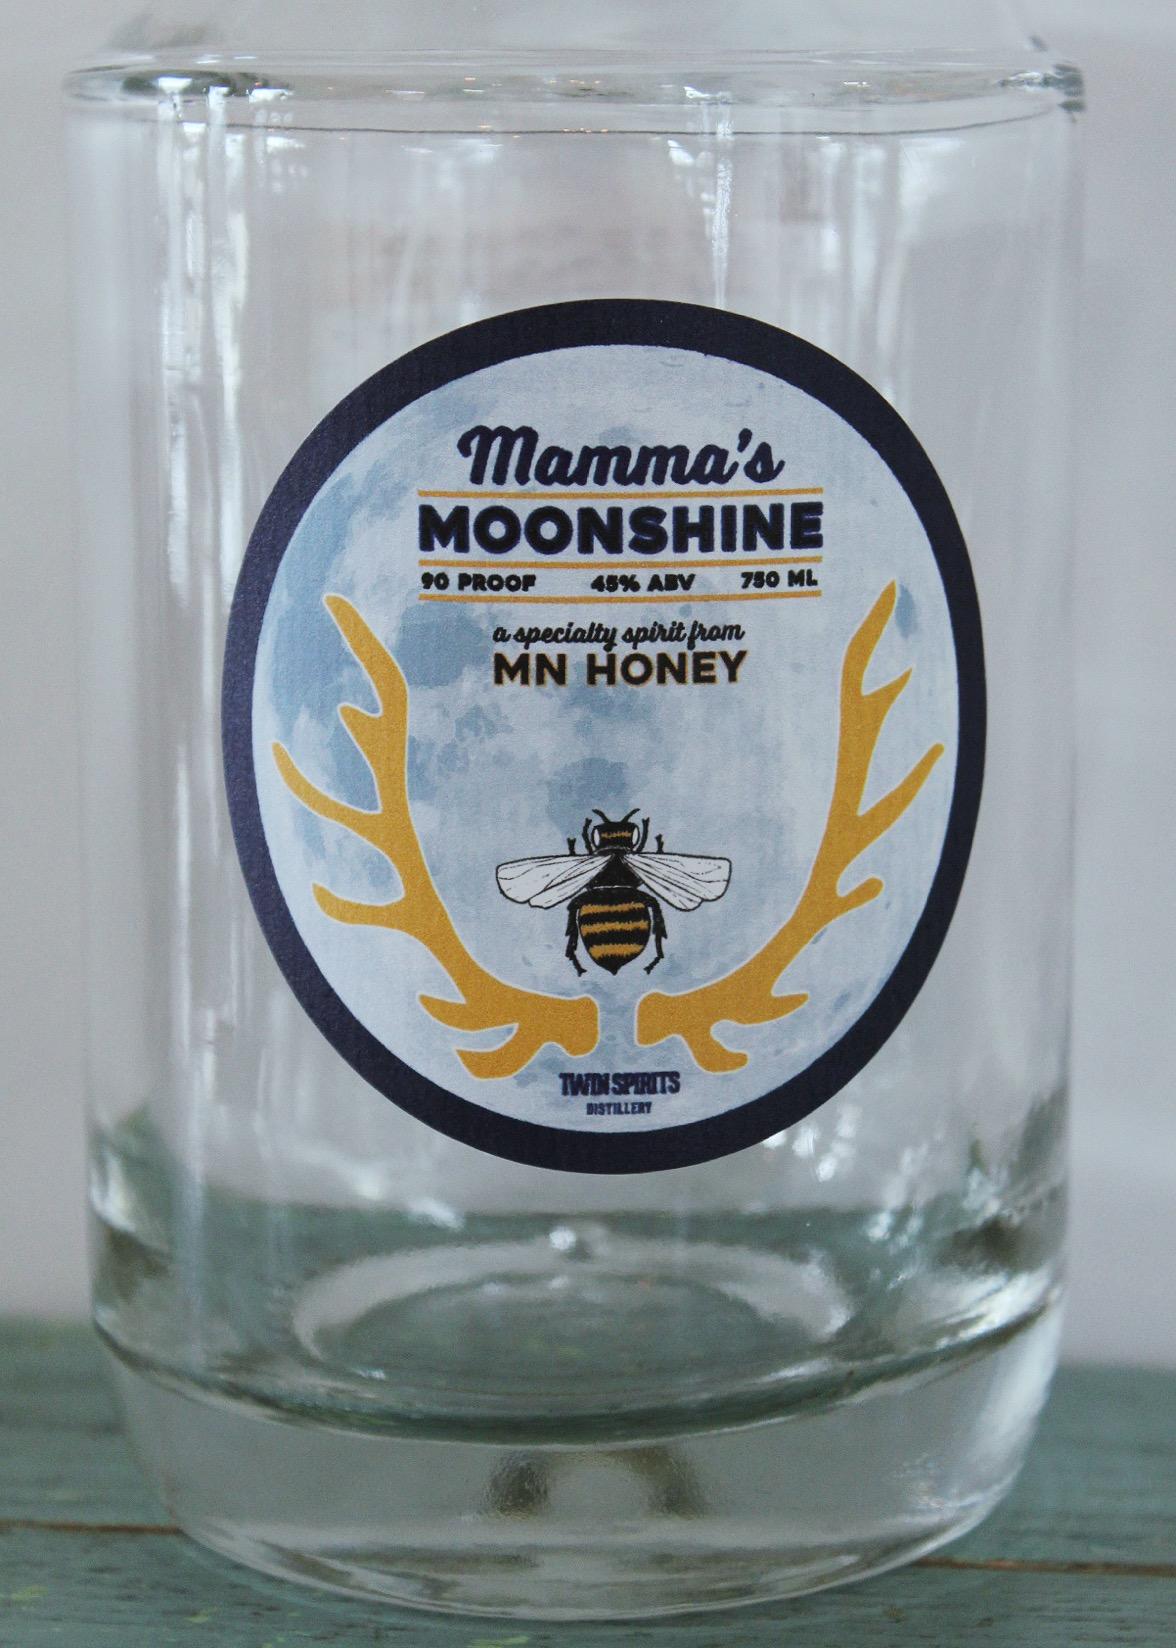 Mamma's Moonshine